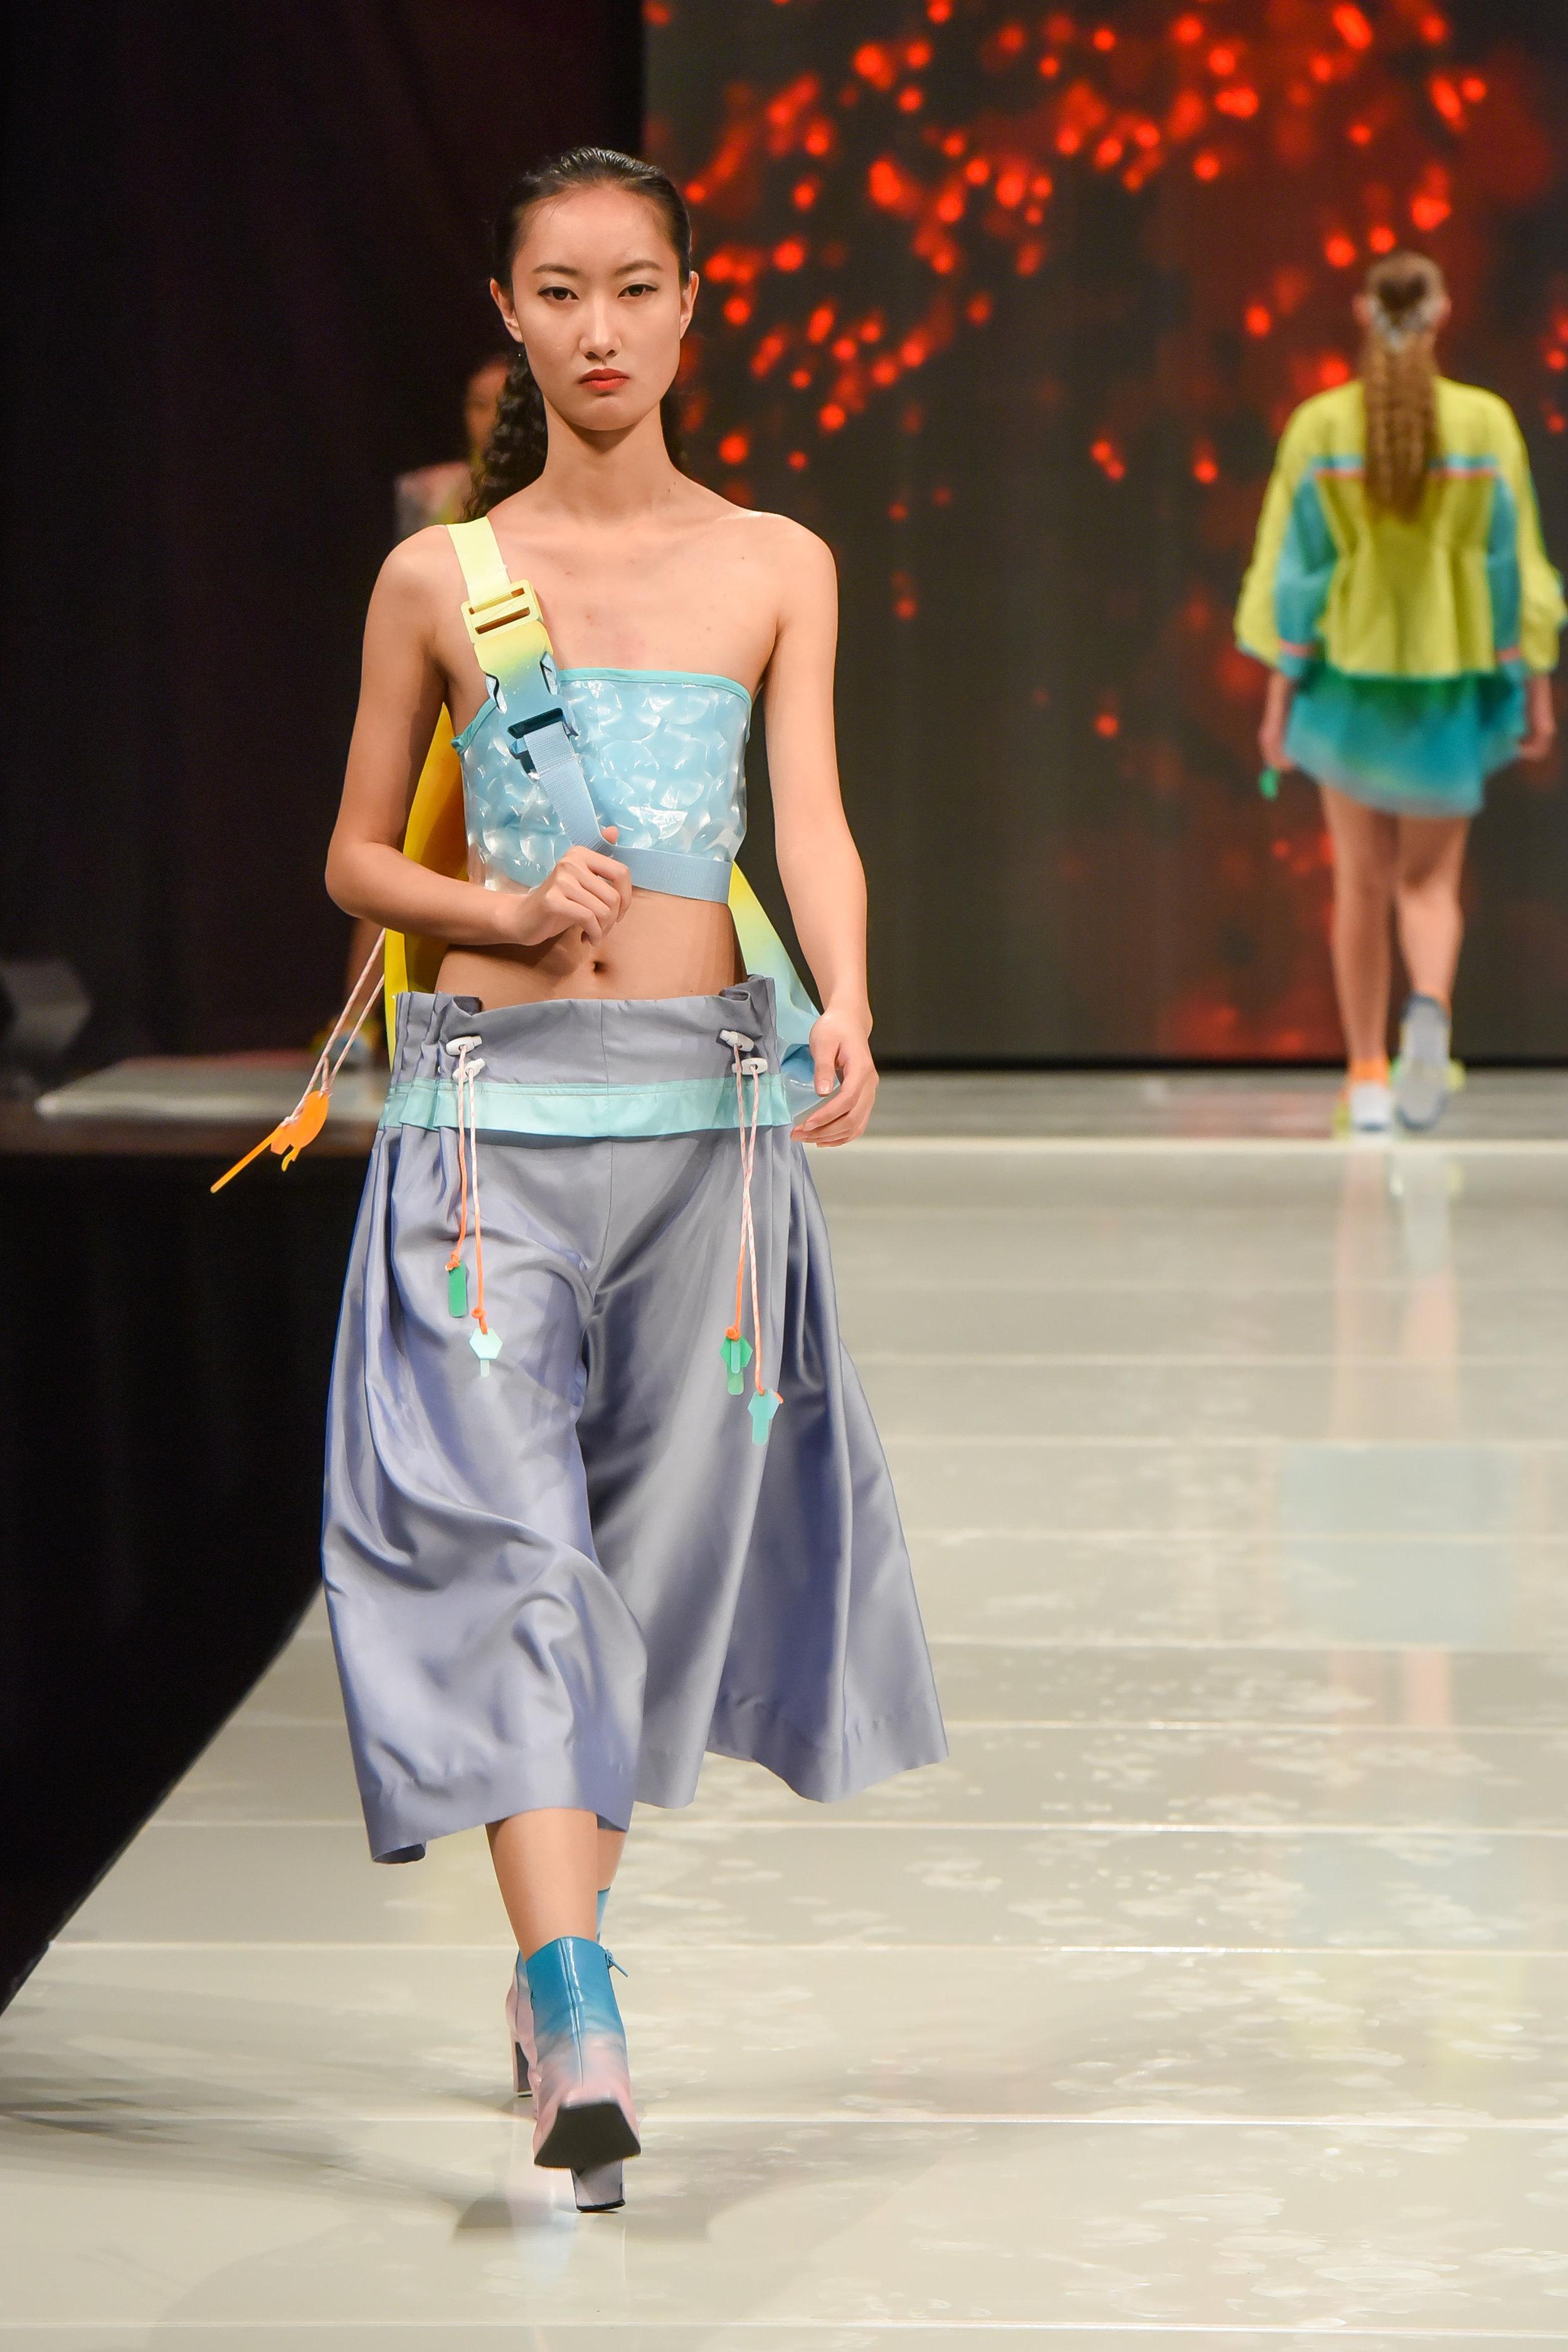 iD2016 - Emerging Designer Awards - Alice Waterhouse_0008.jpg